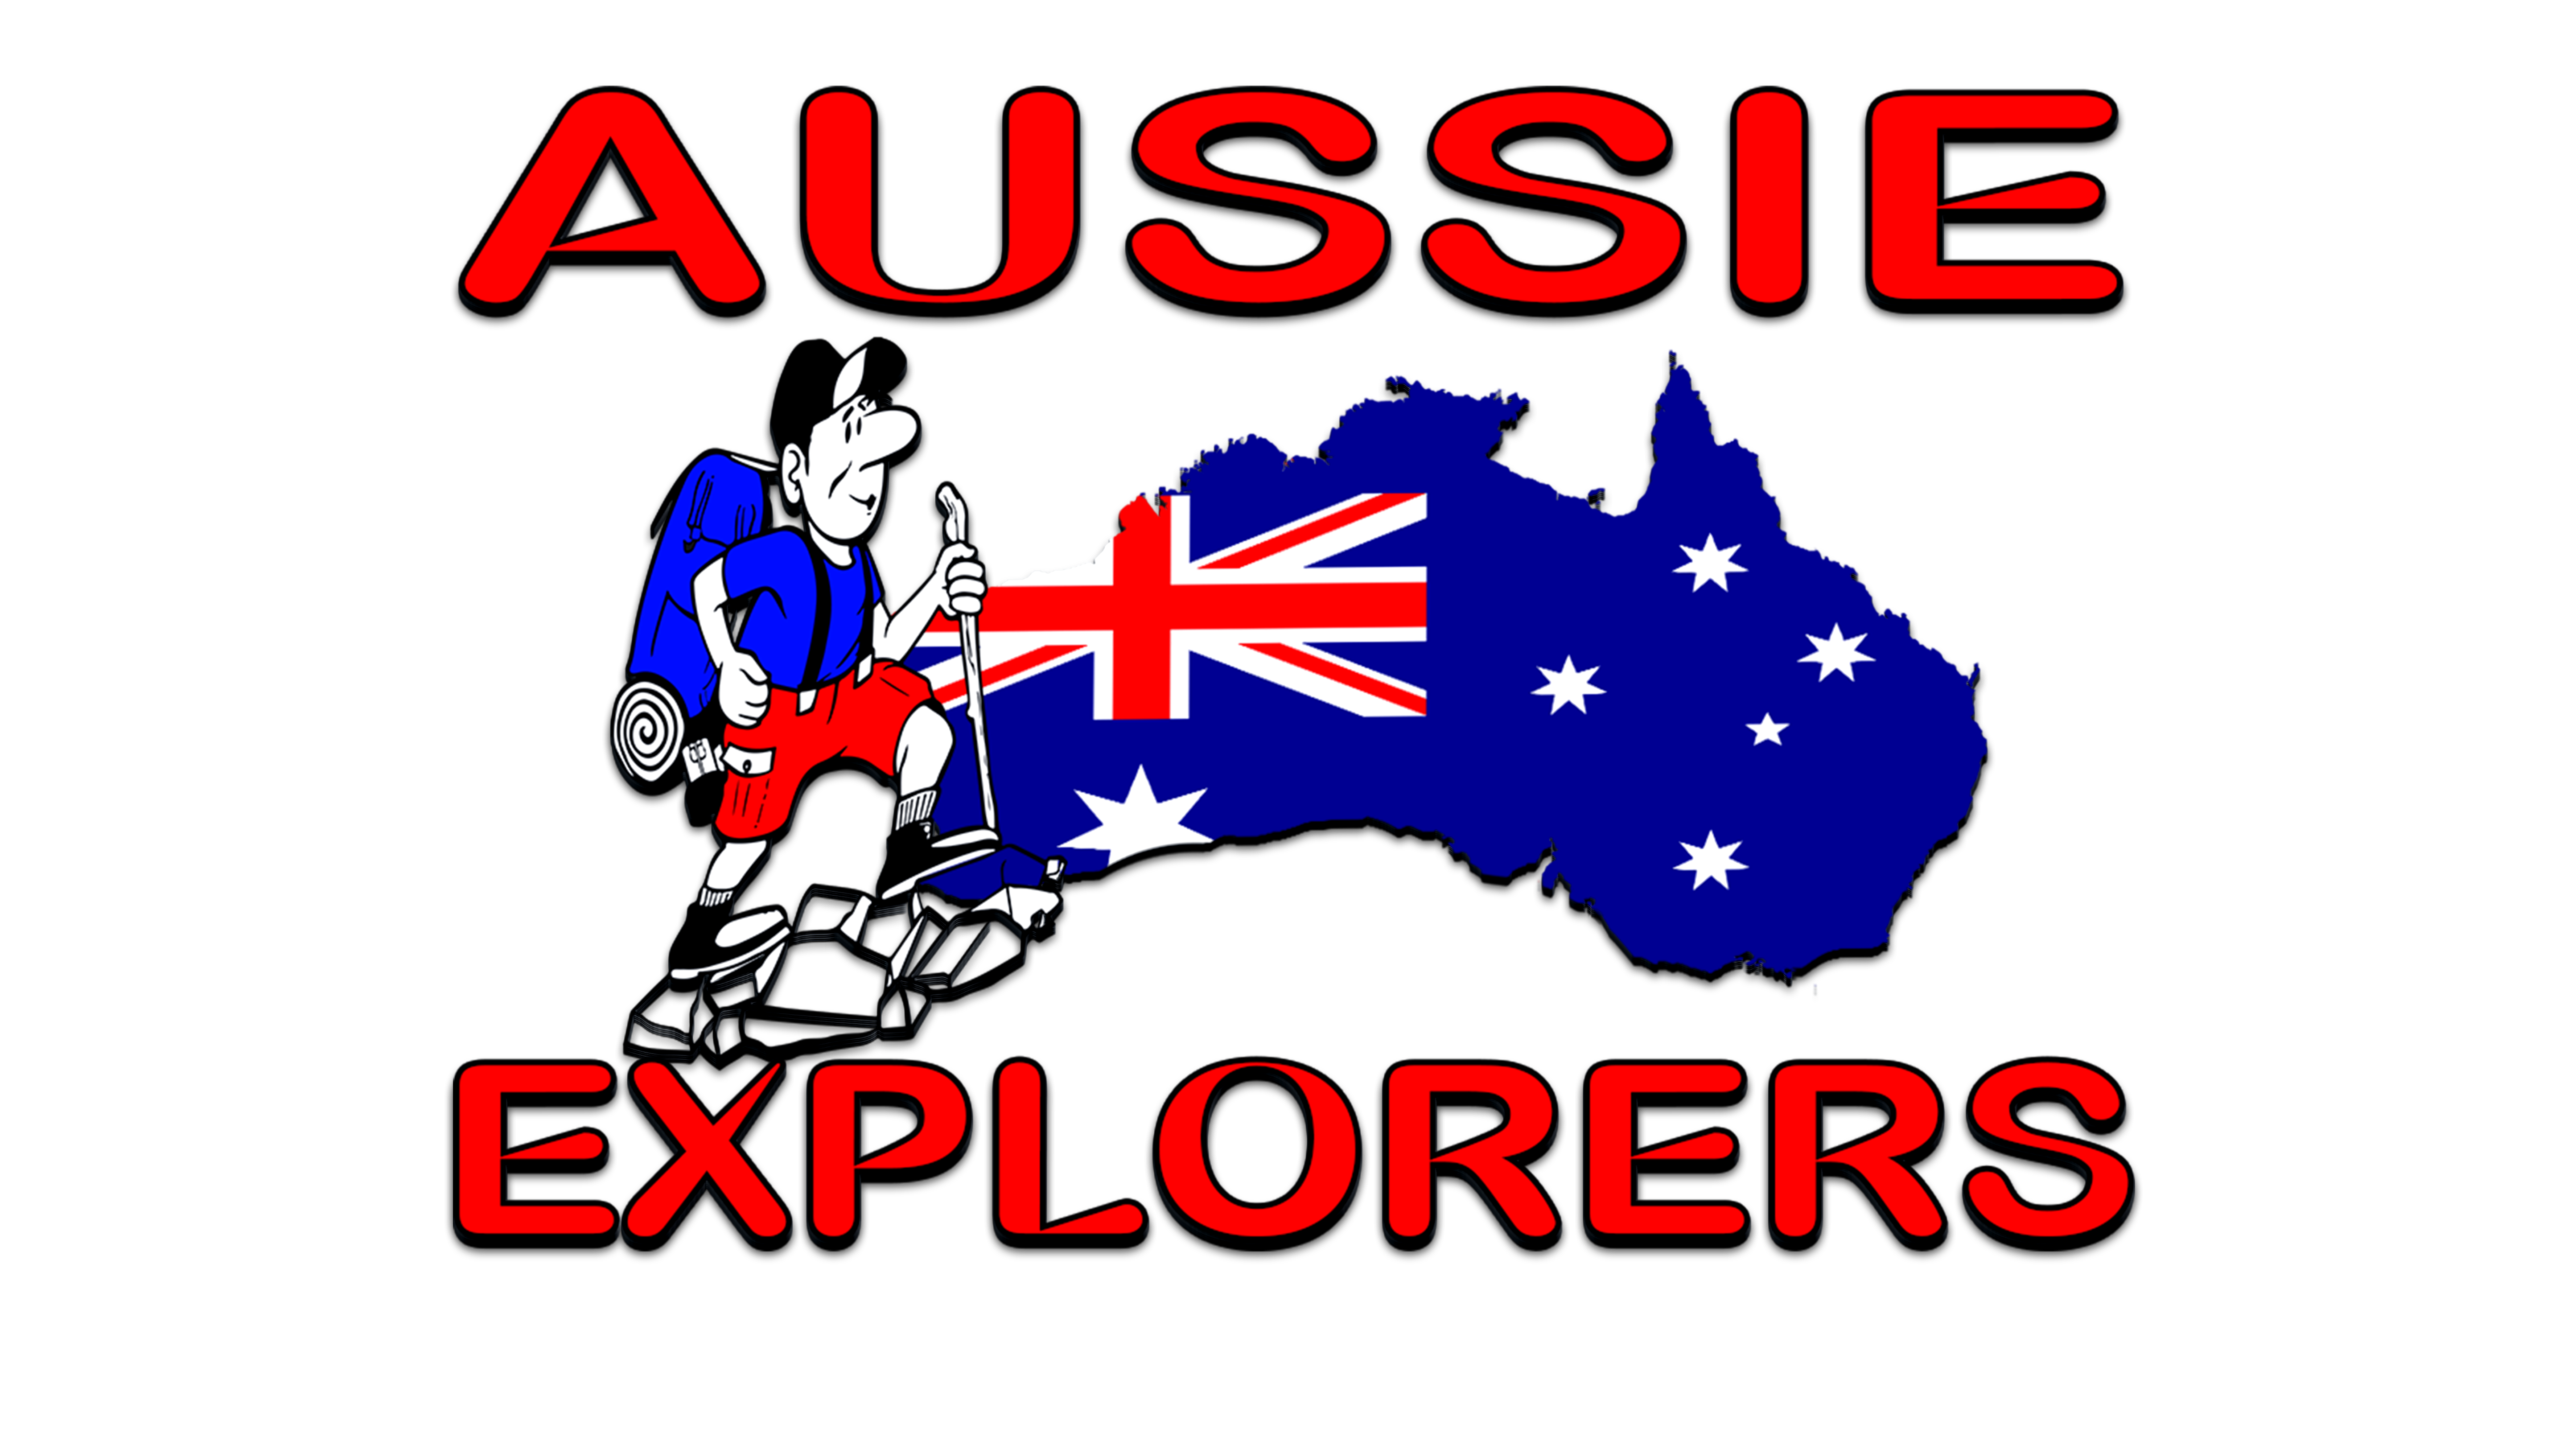 Upcoming events | Aussie Explorers (Sydney, Australia) | Meetup